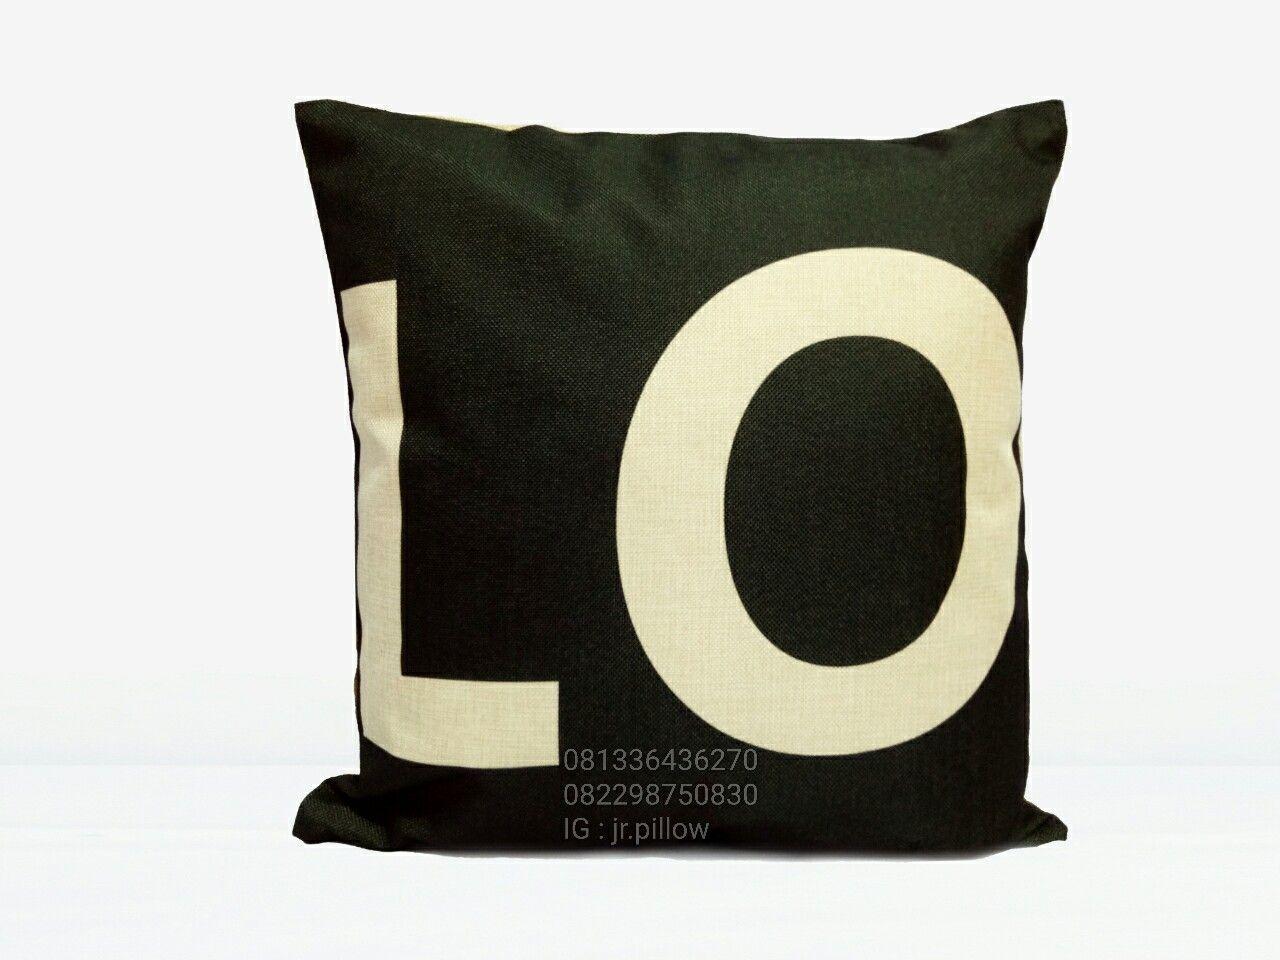 Price : 80rb (sarung saja) + 20rb utk isi bantal  Material : Baby Canvas Size : 45x45 Contact : 081336436270 , 082298750830 IG : jr.pillow